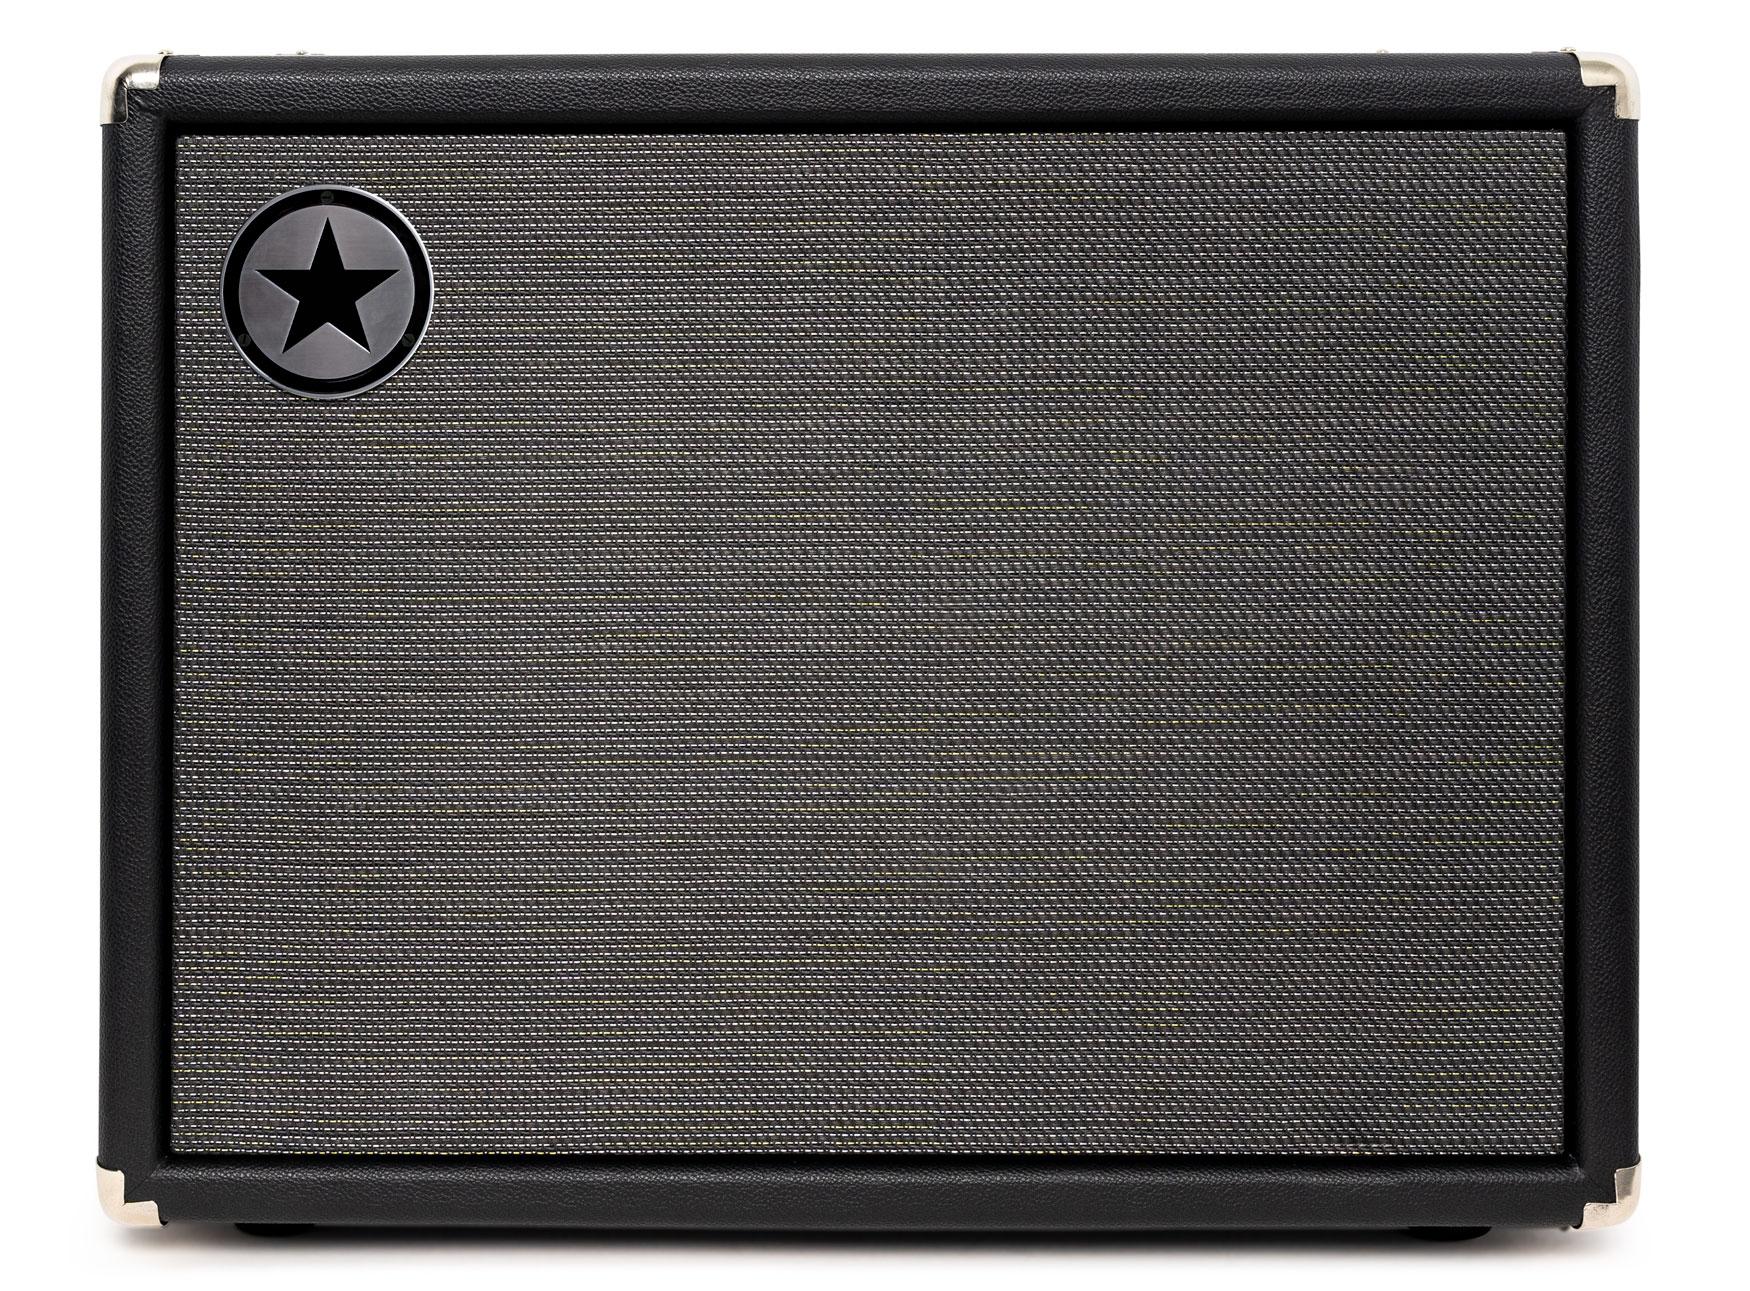 BLACKSTAR Unity Bass 2 x 10 Cabinet - Bassi Amplificatori - Combo